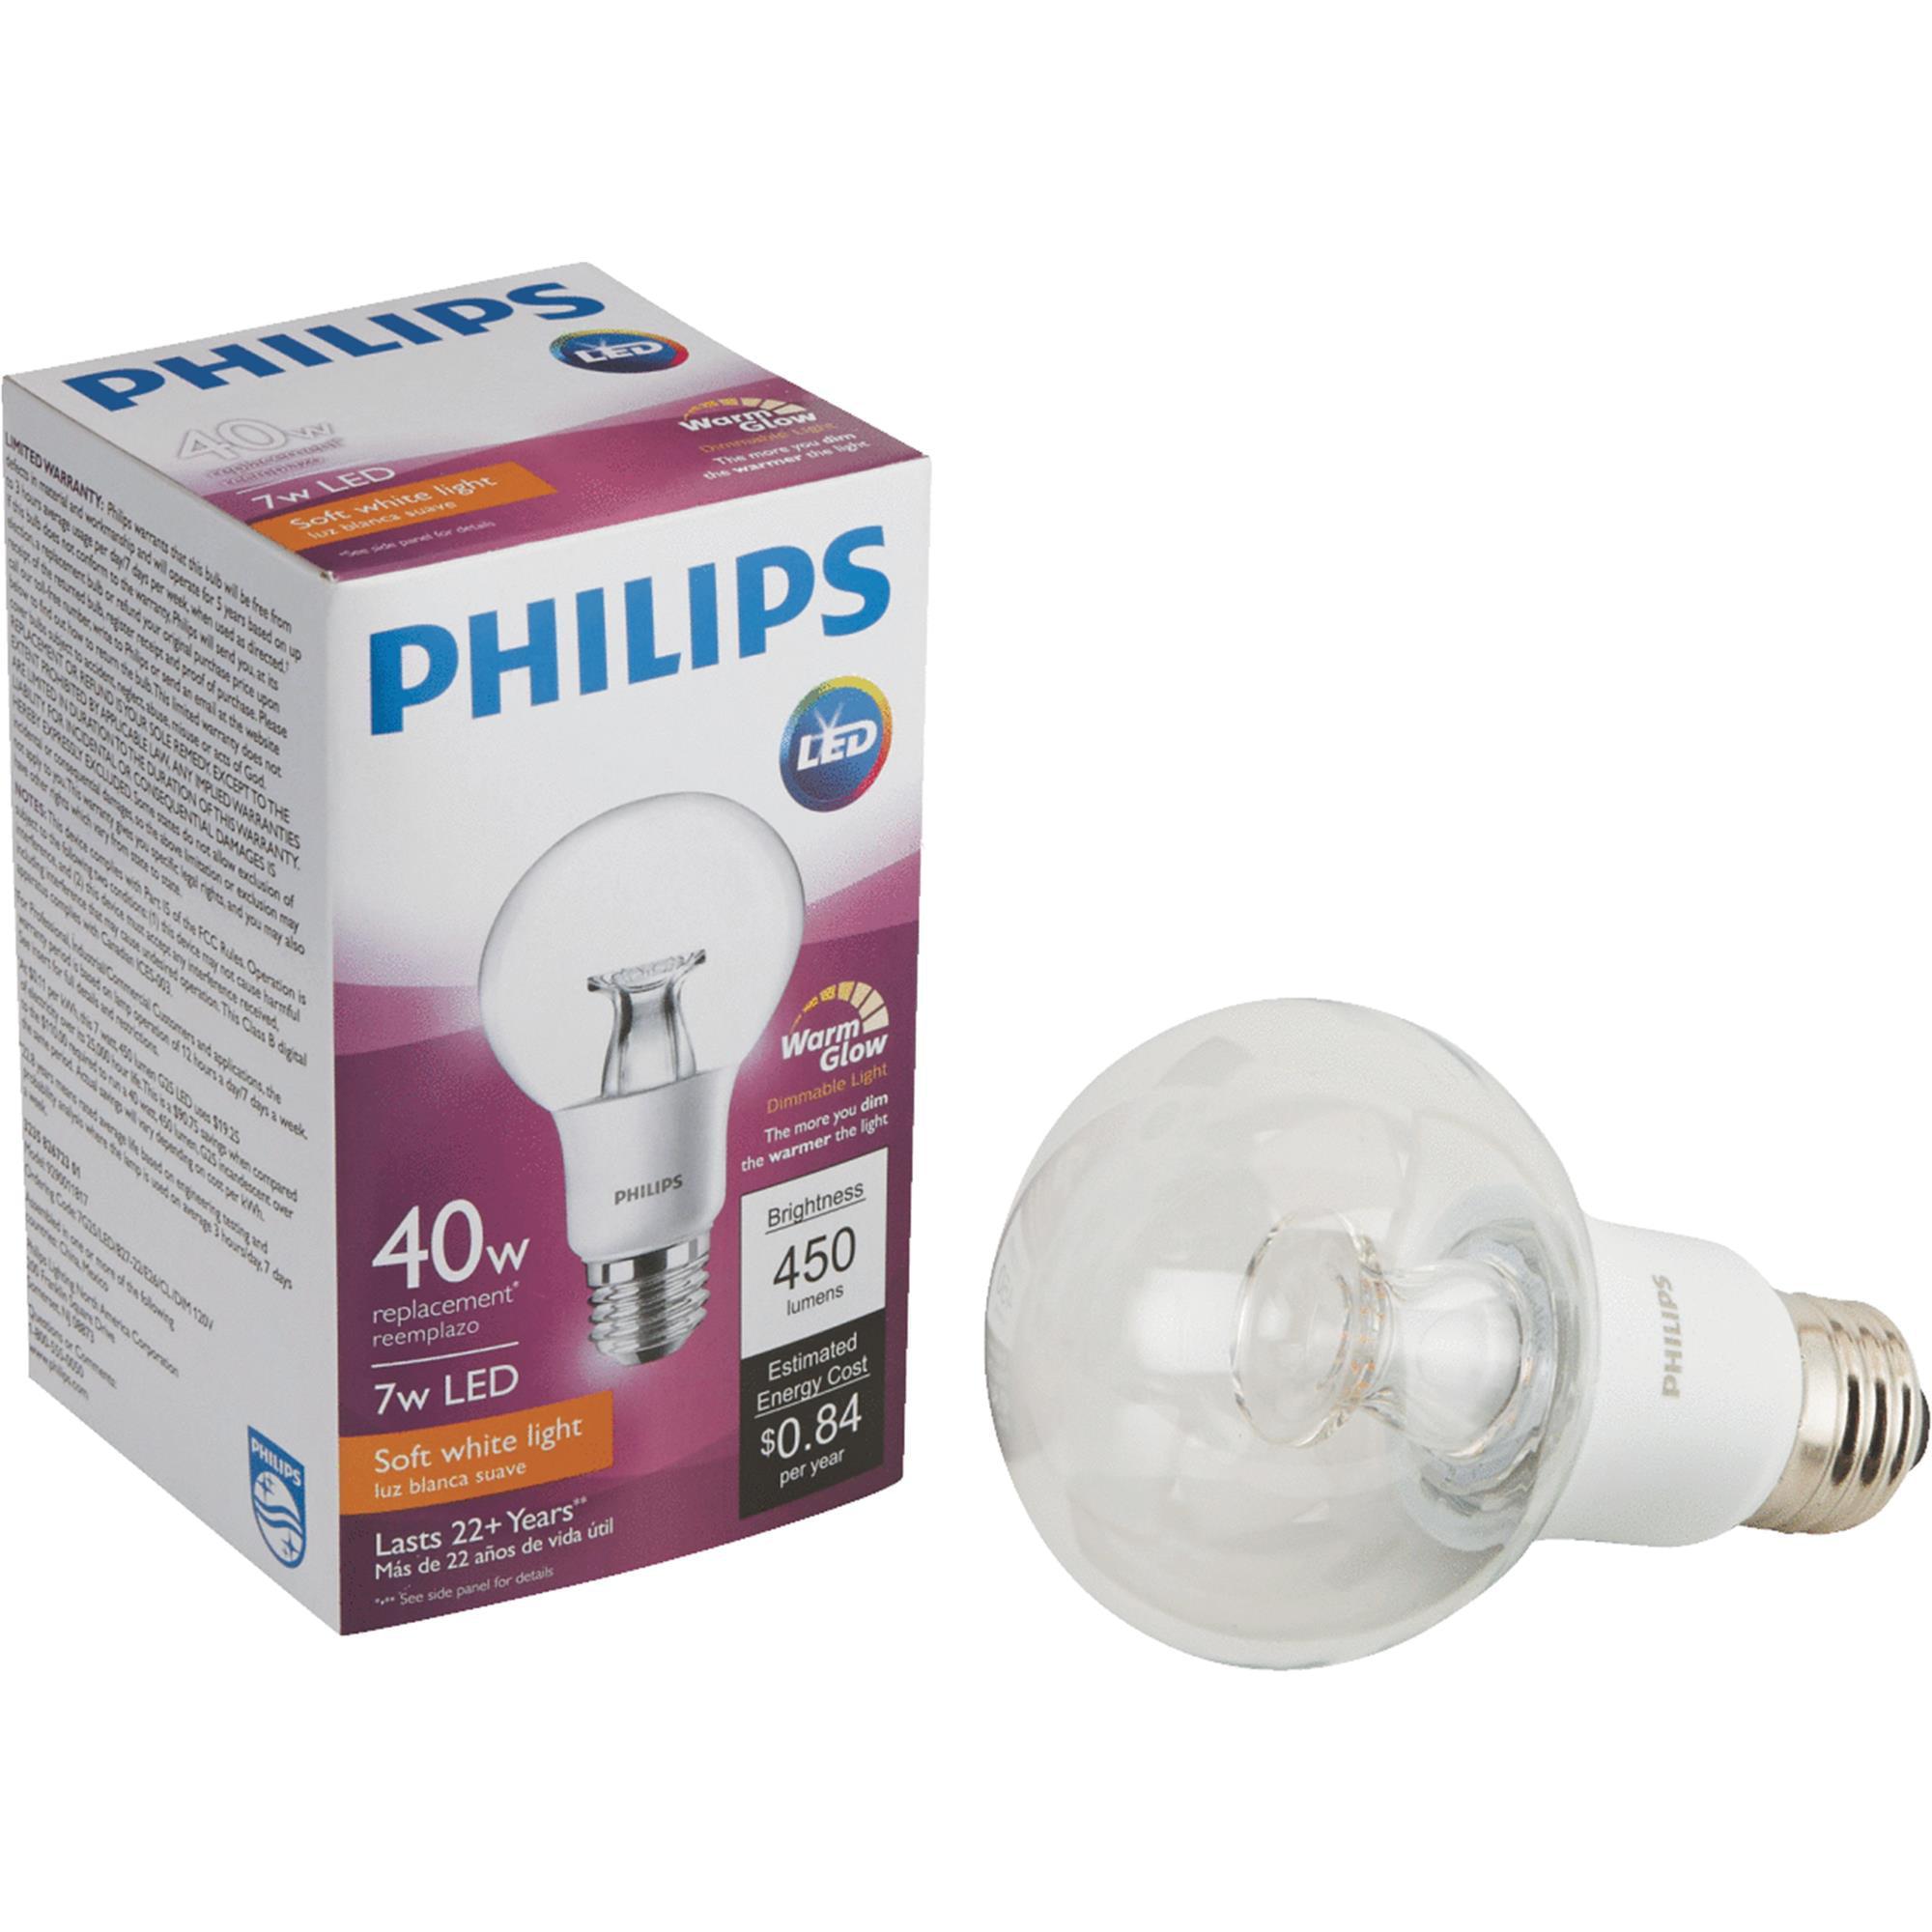 Philips Warm Glow G25 Medium Dimmable LED Decorative Globe Light Bulb